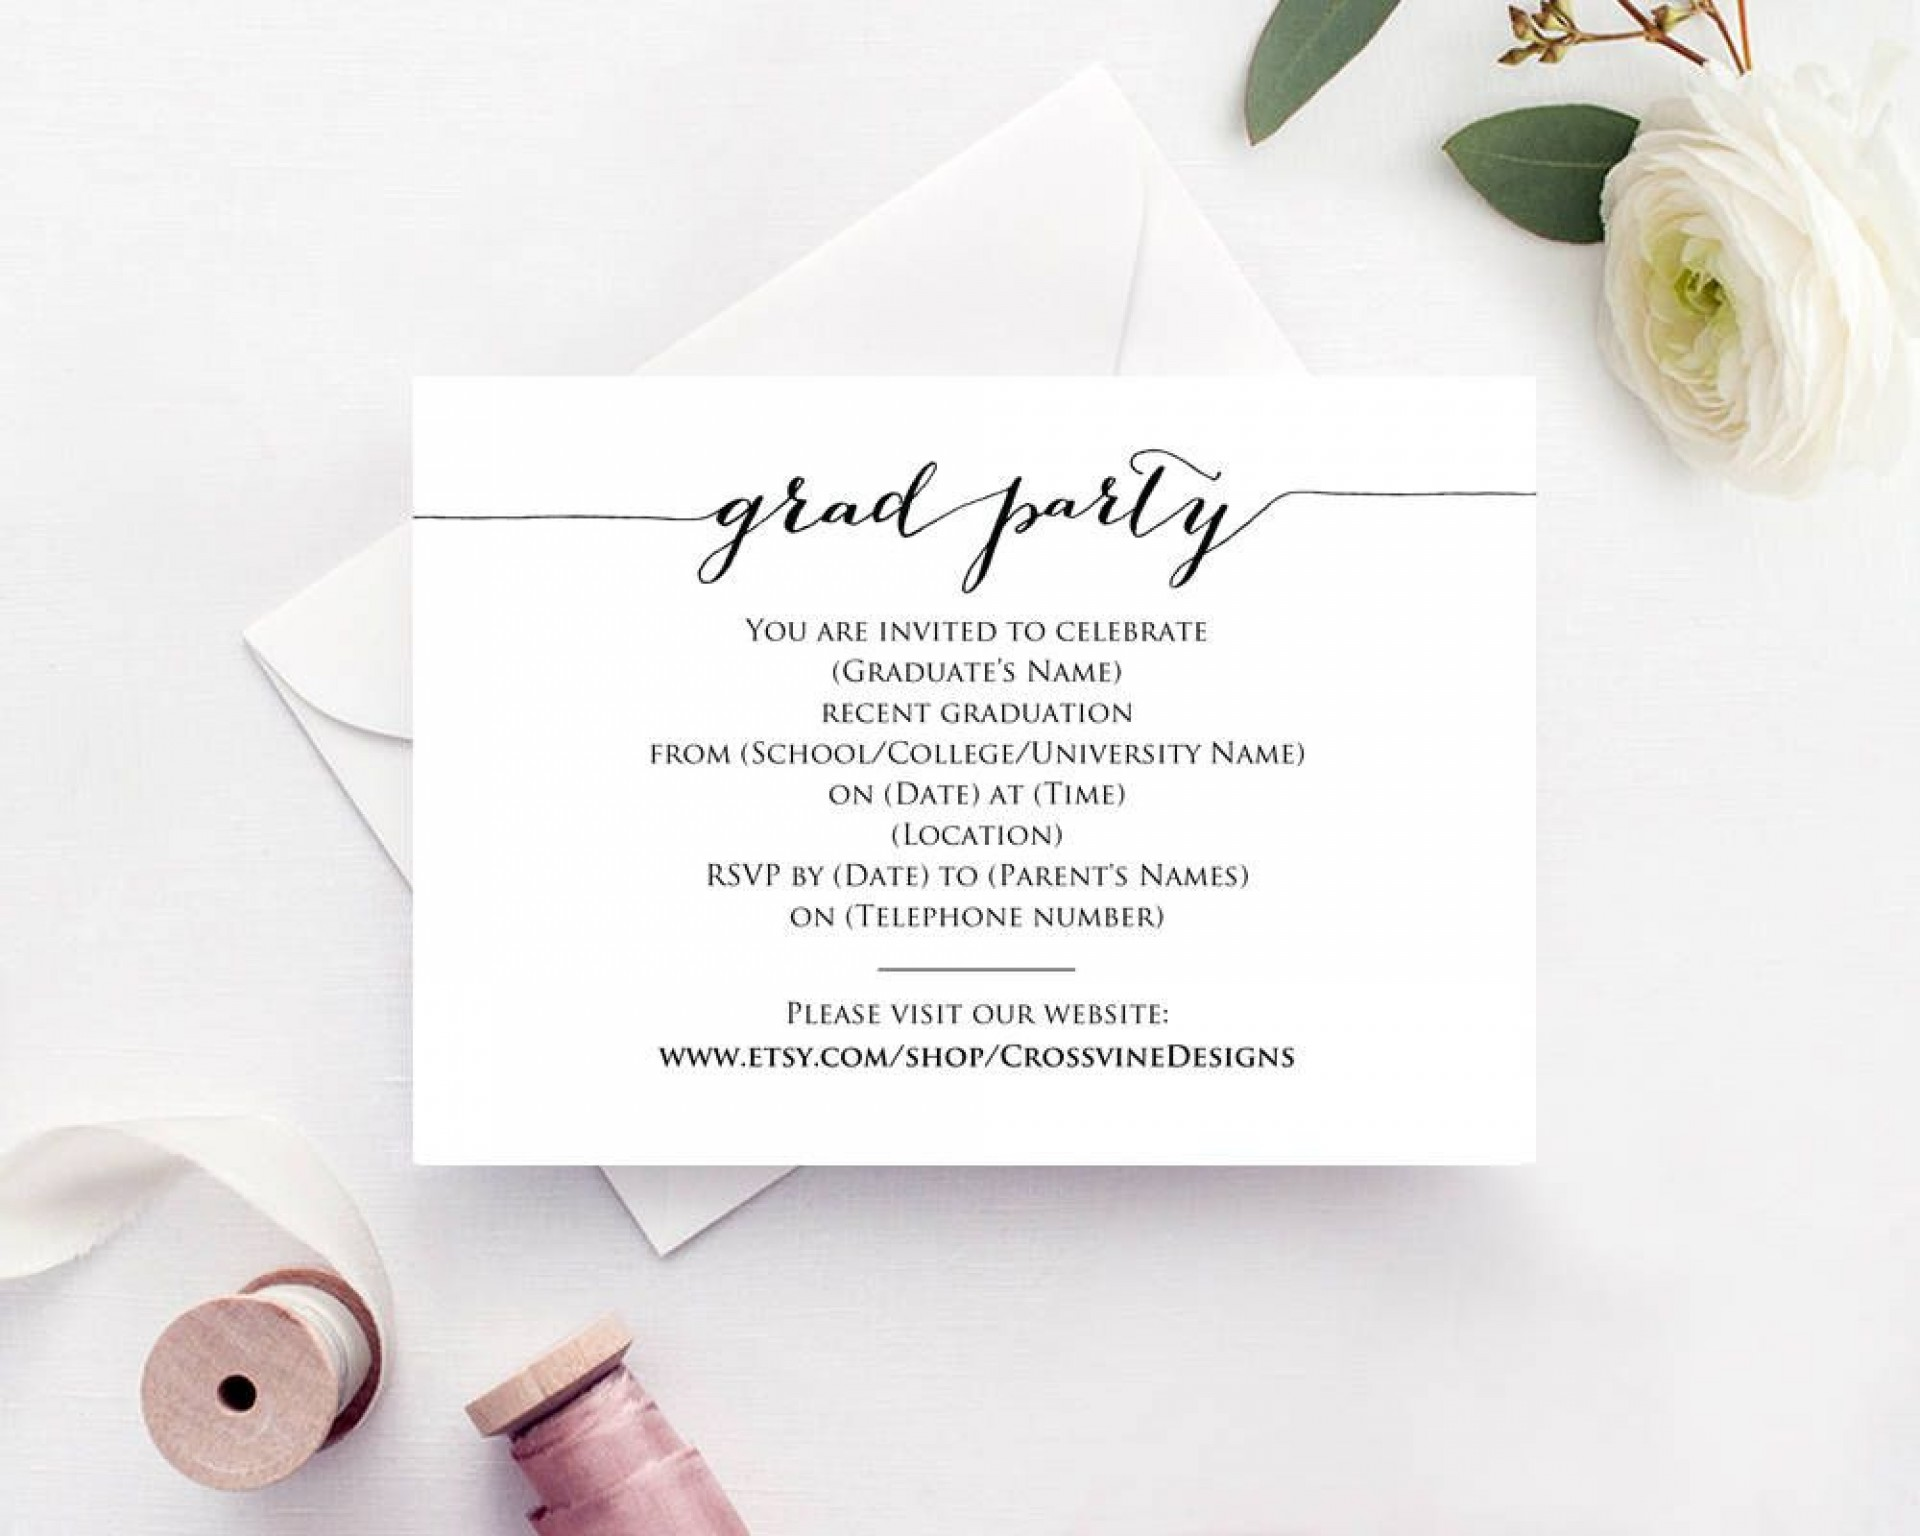 006 Best Graduation Party Invitation Template Design  Templates 4 Per Page Free Reception1920